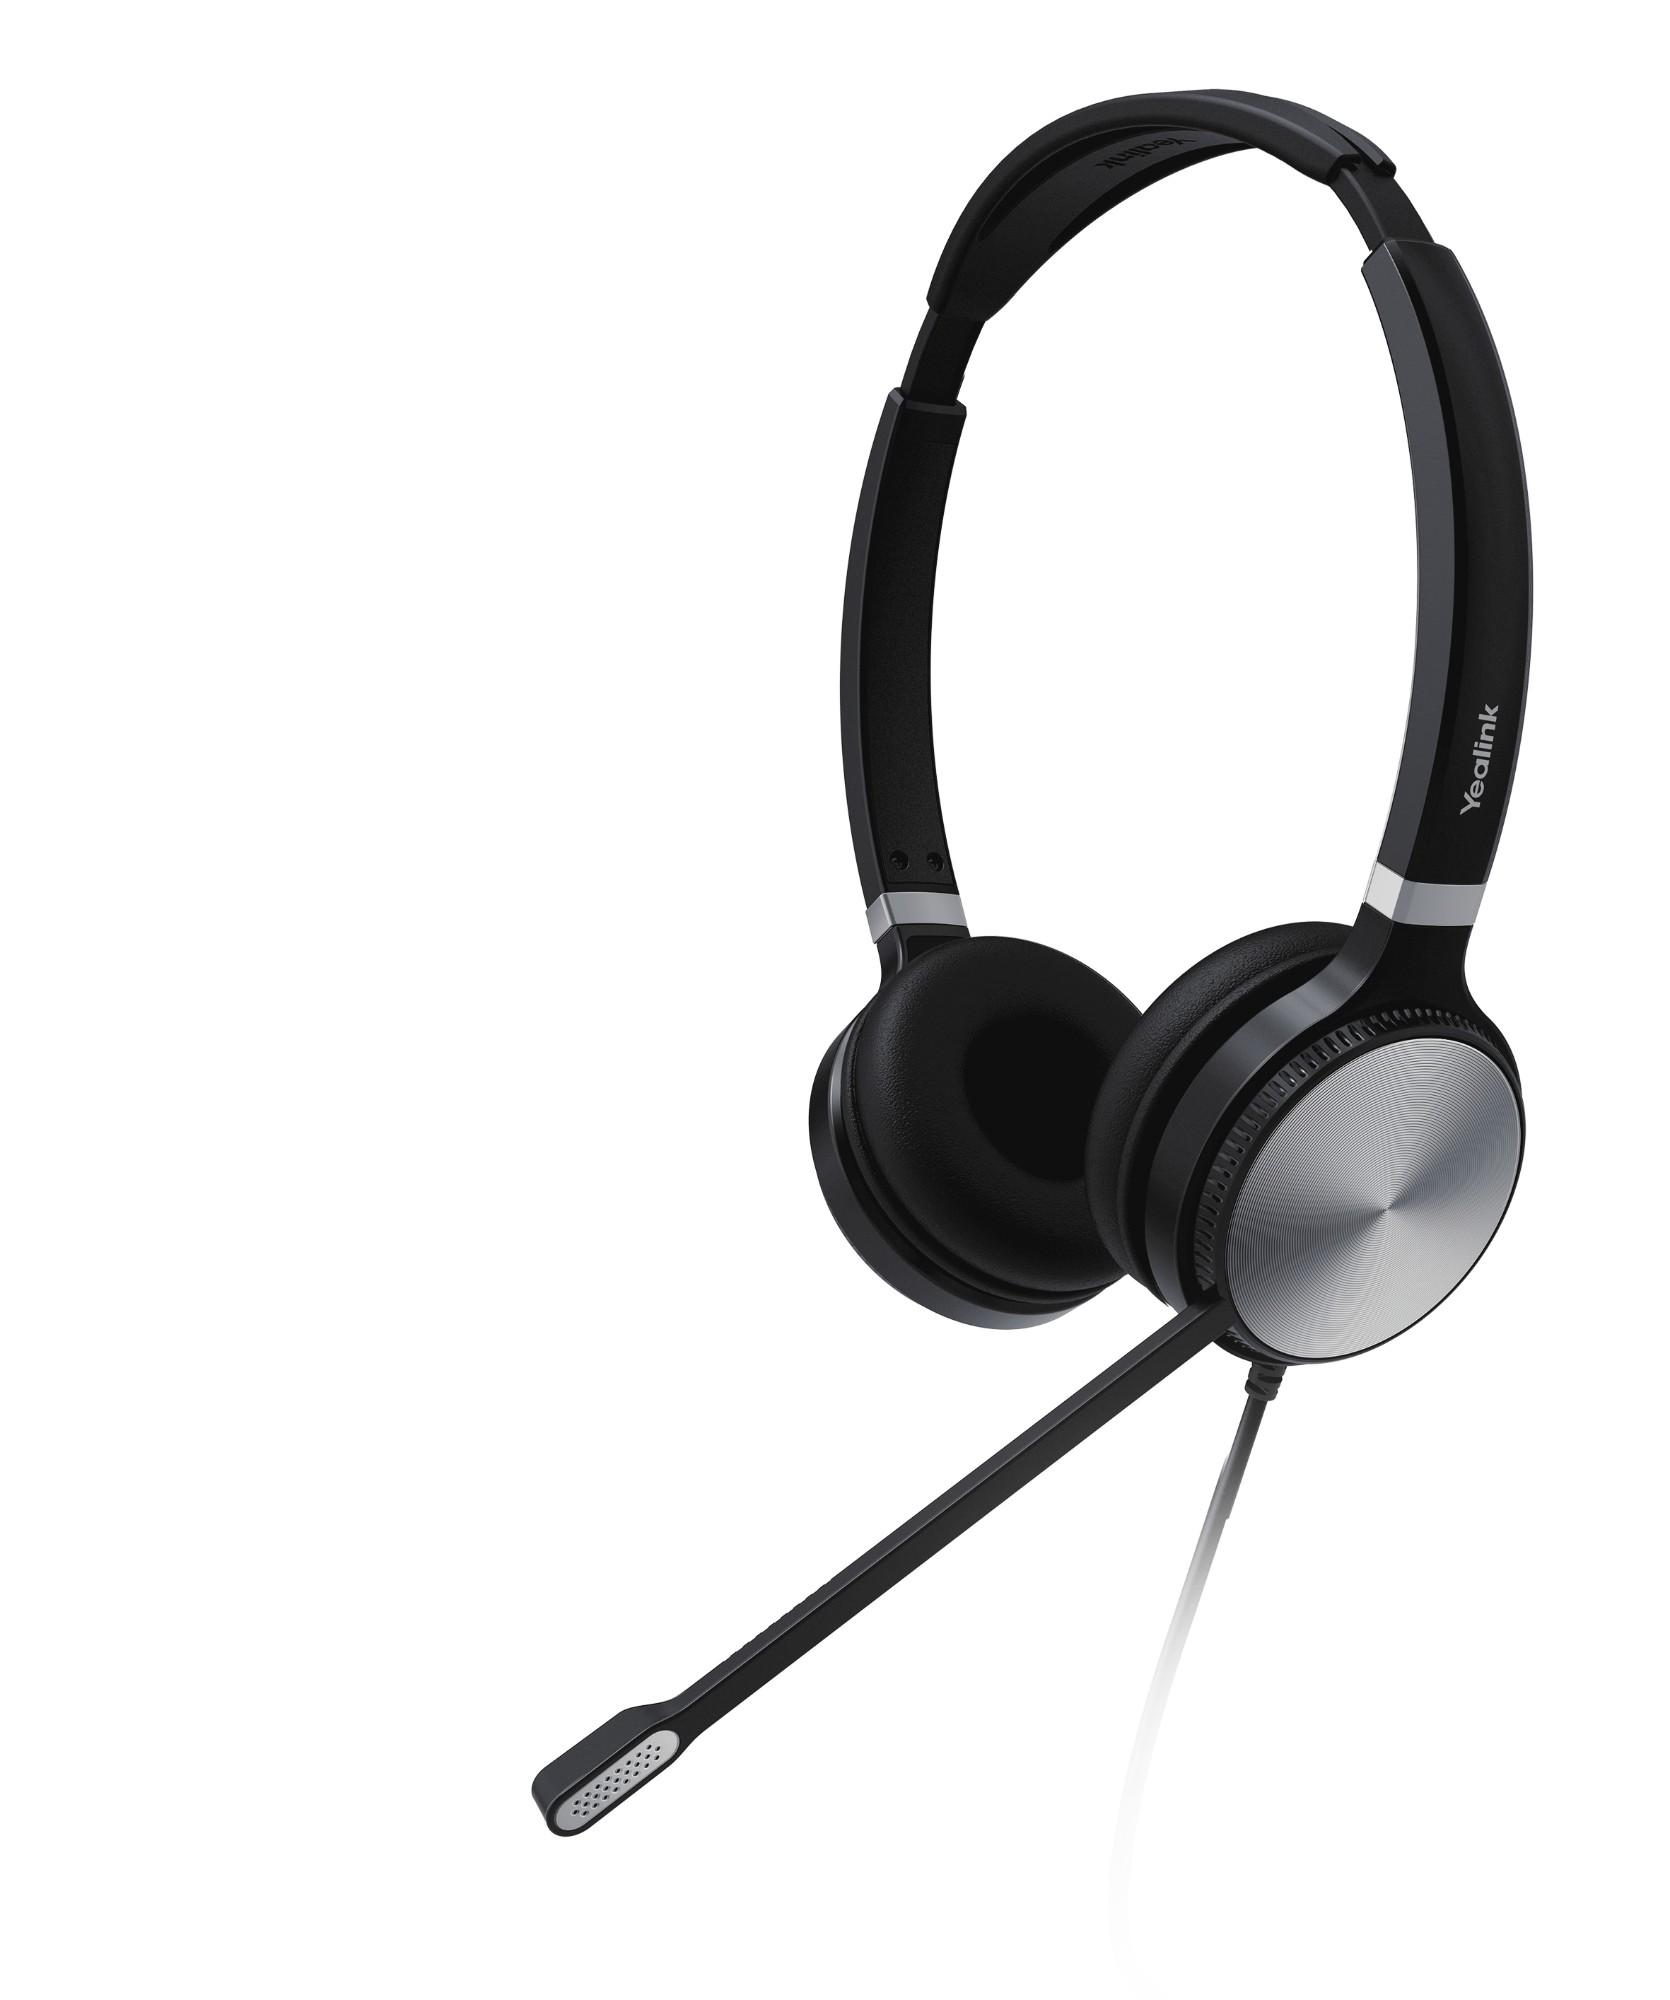 Yealink UH36 Dual Headset Head-band Black, Silver